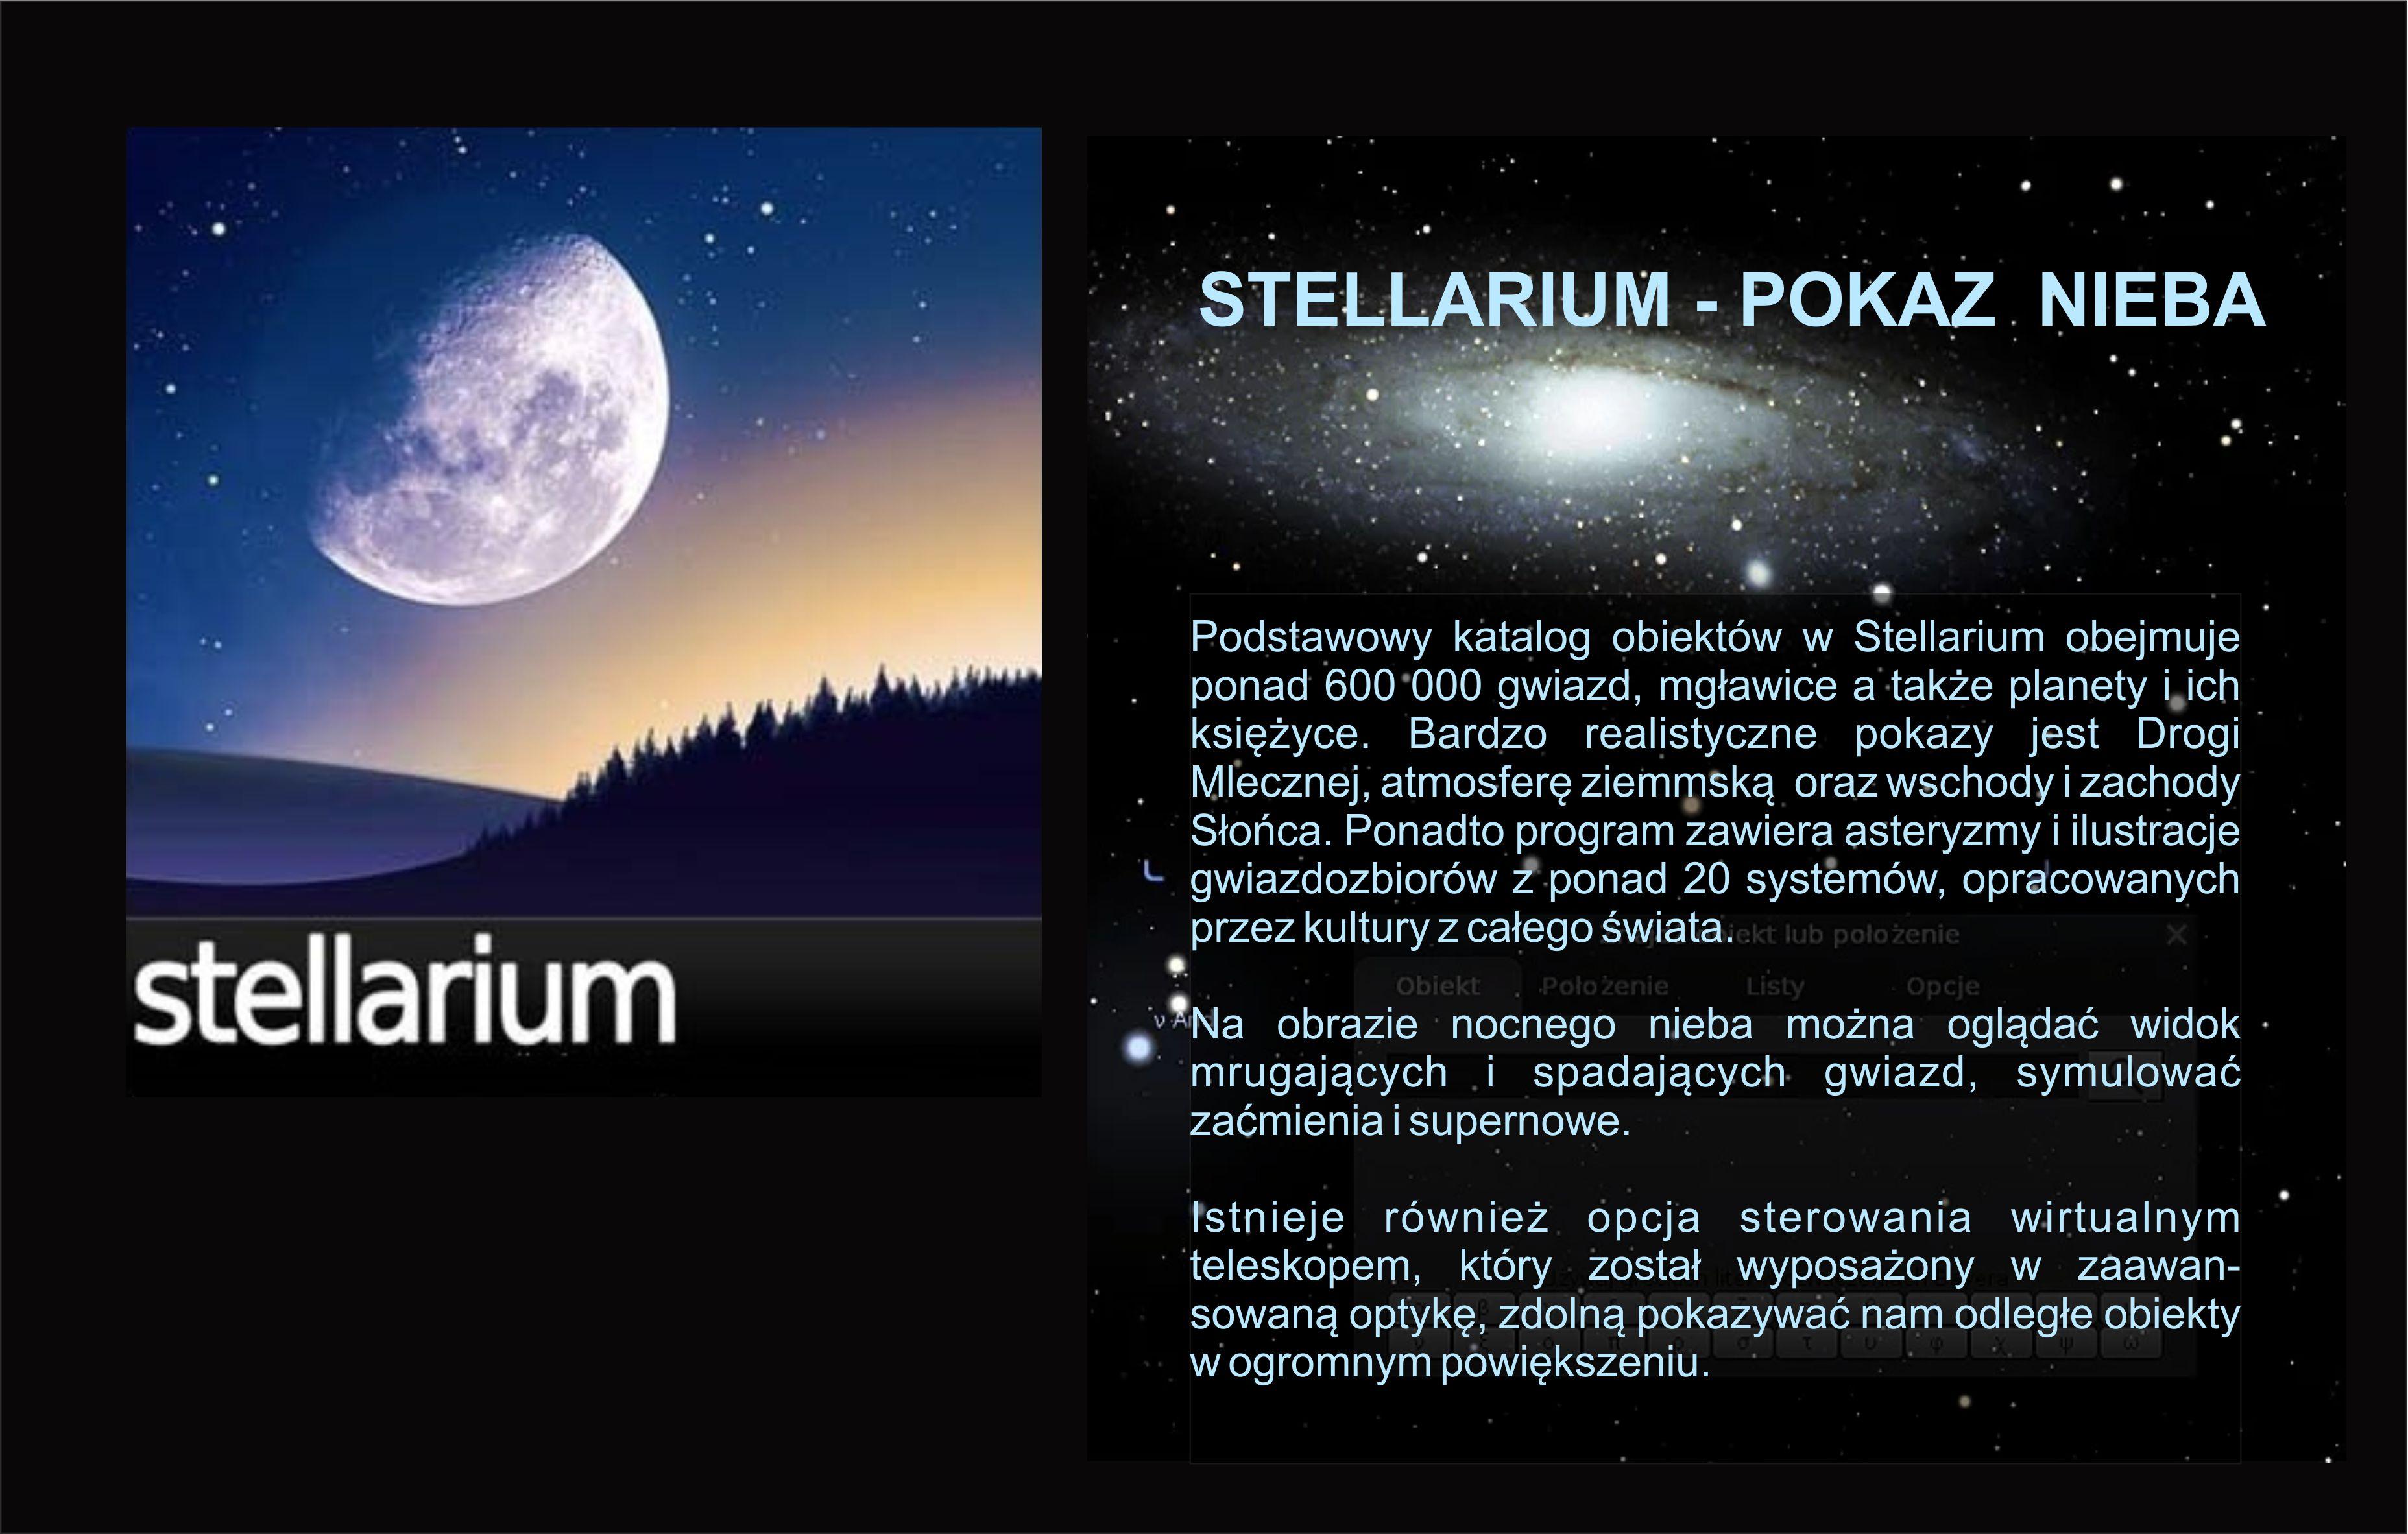 PLANETARIUM BOLMIN